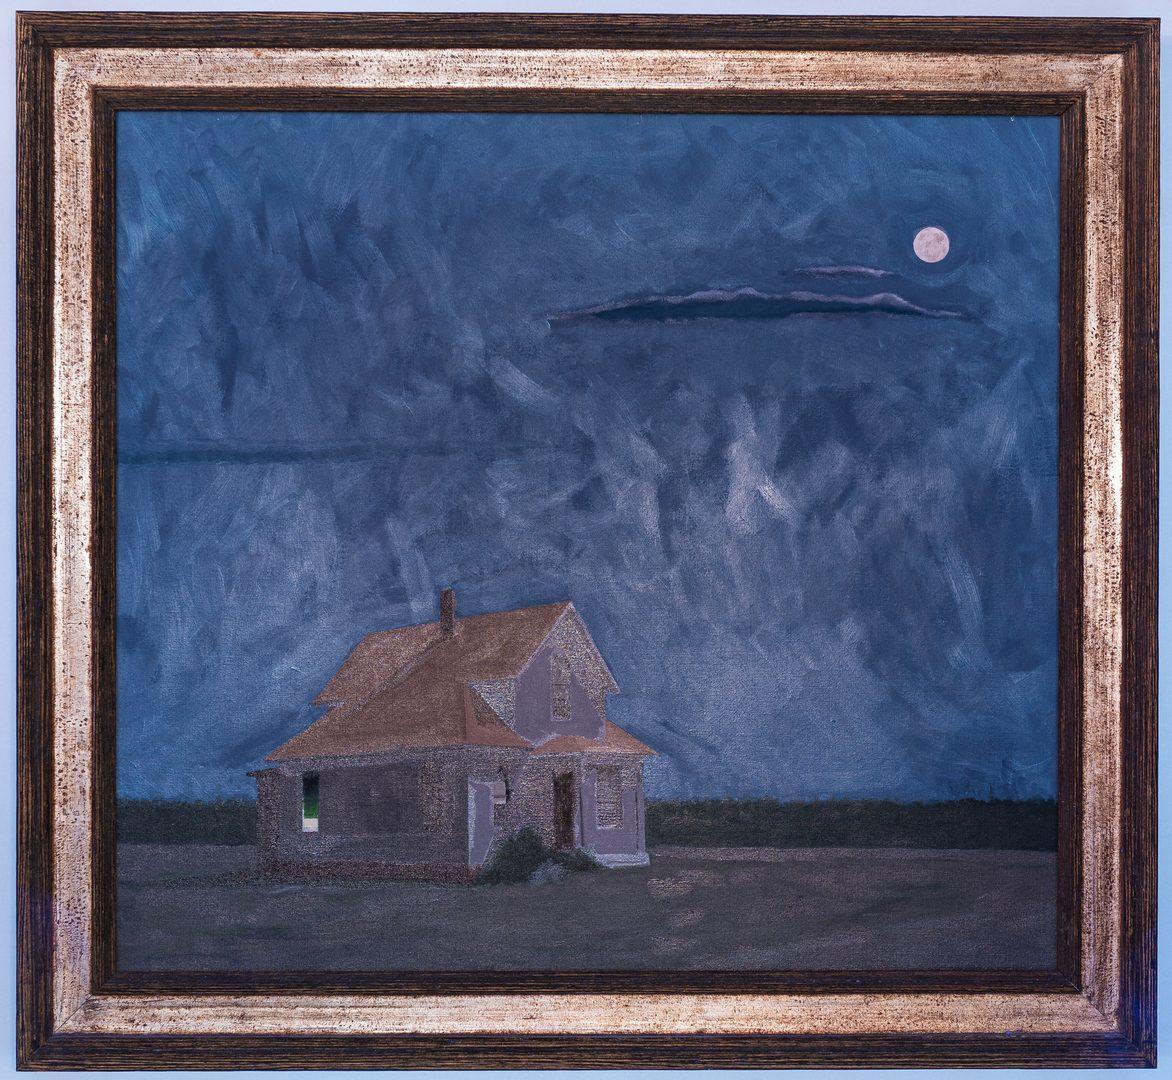 Lot 521: Joseph Richards O/C, Farmhouse Under Full Moon